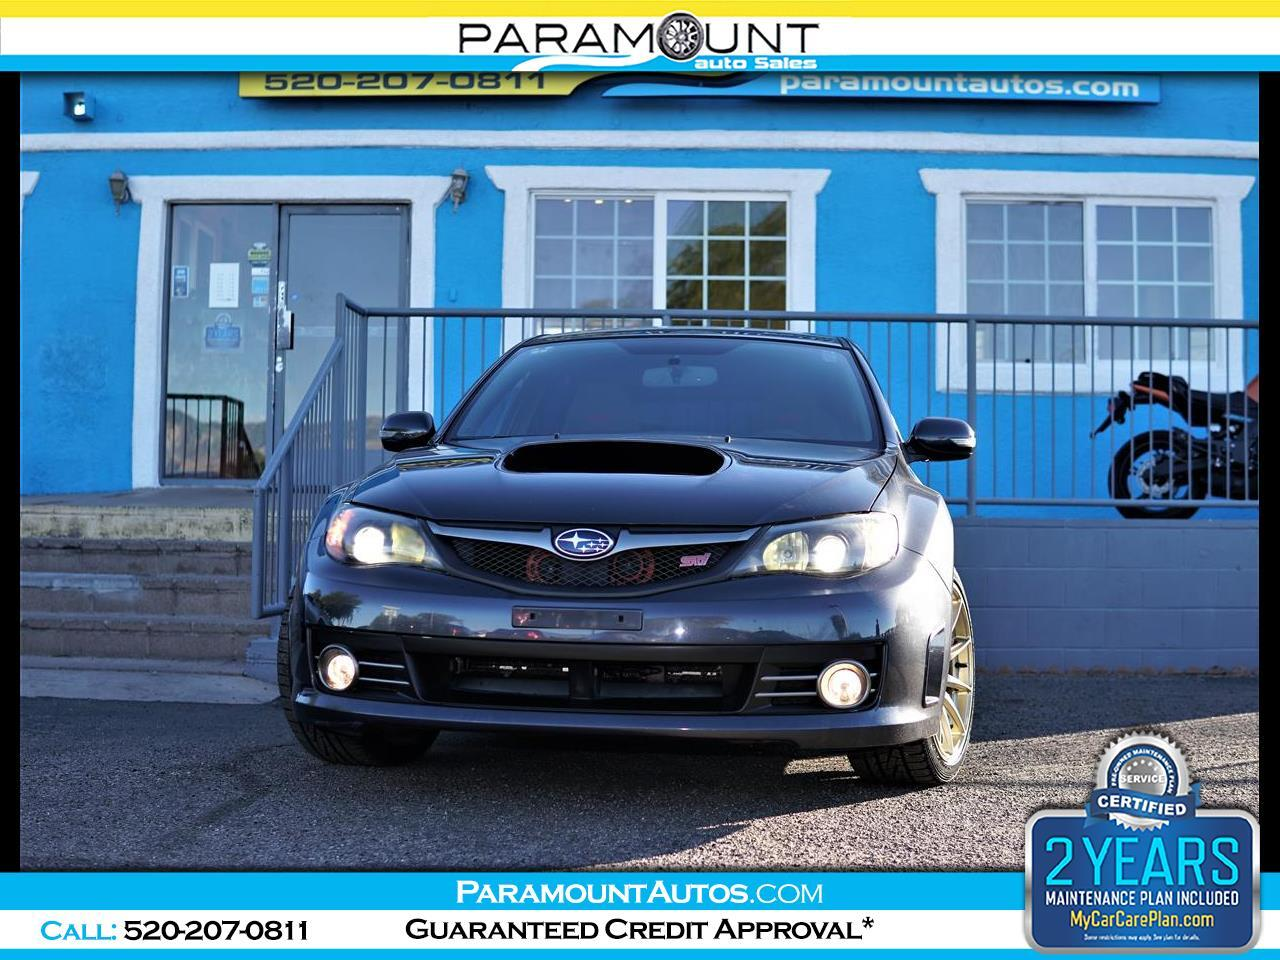 Subaru Impreza 5dr Man STI w/Slvr Wheels/Nav 2008